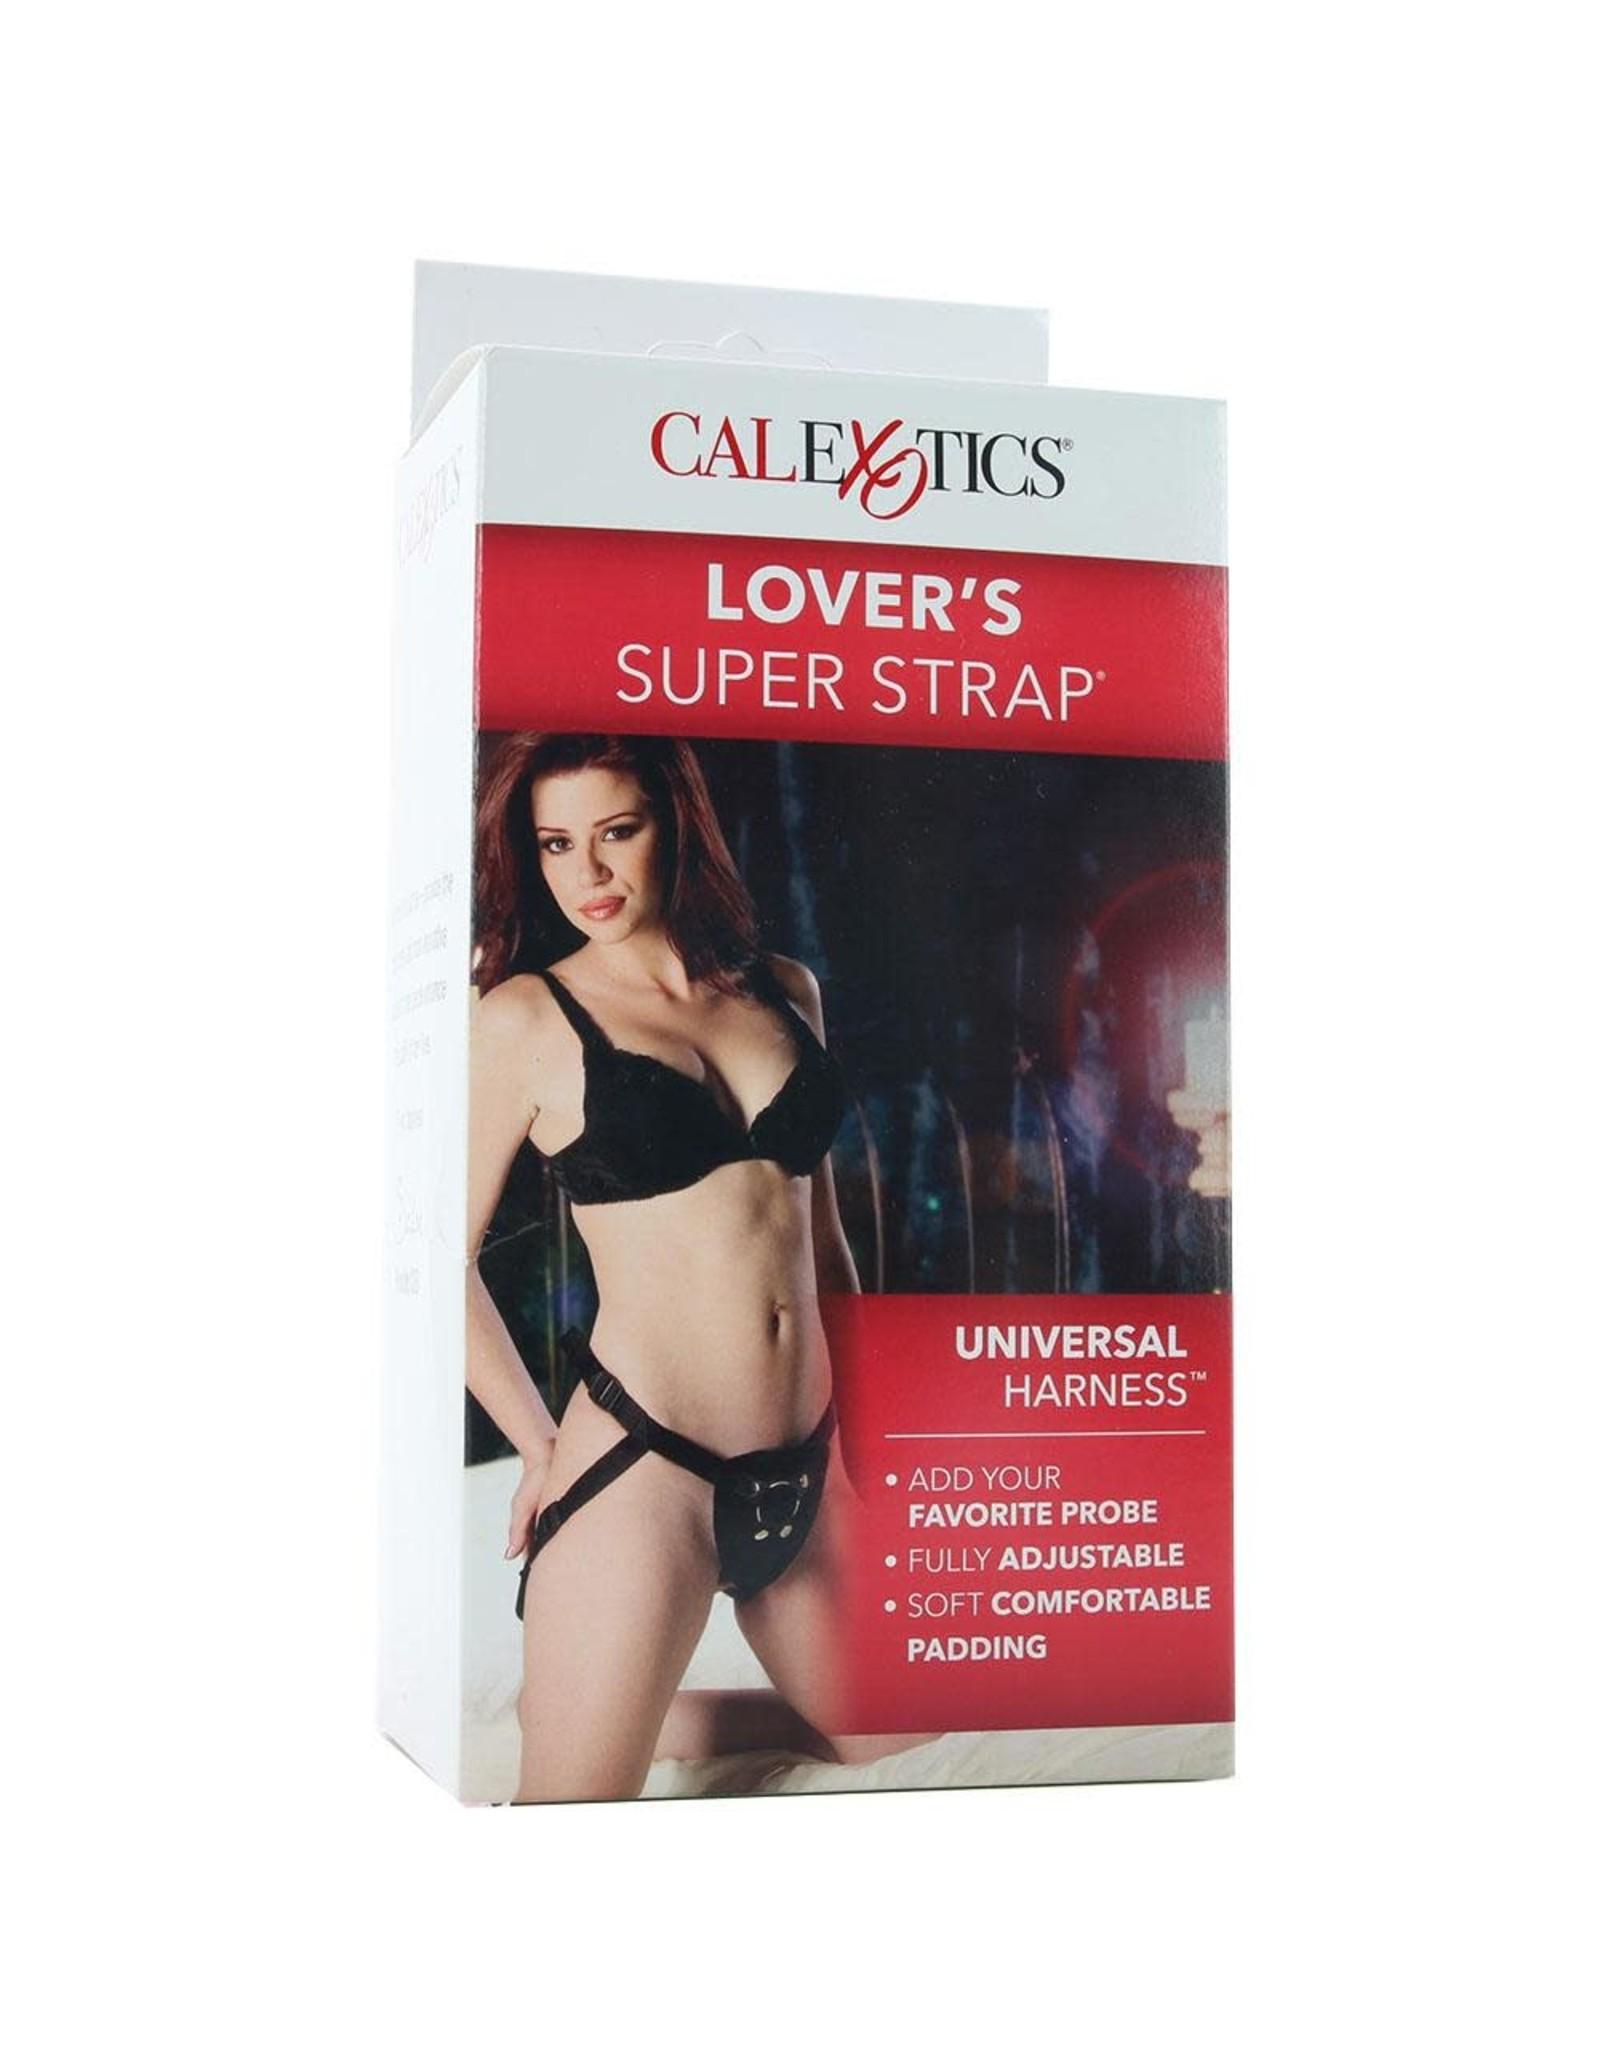 CALEXOTICS CALEXOTICS - LOVER'S SUPER STRAP - UNIVERSAL HARNESS